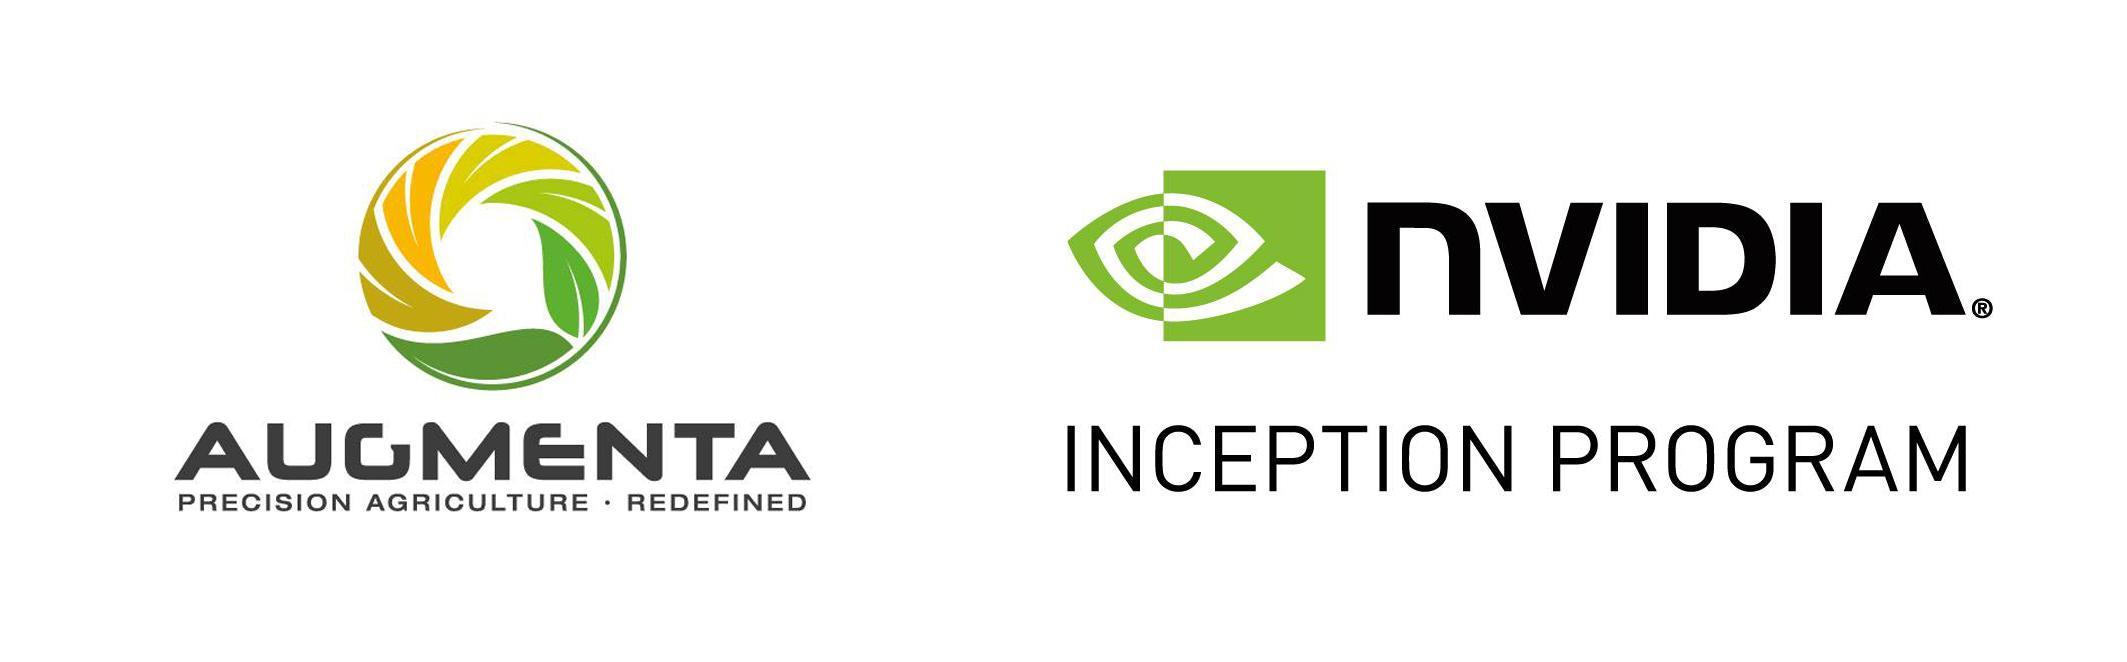 Augmenta - NVIDIA Partnership Announcement